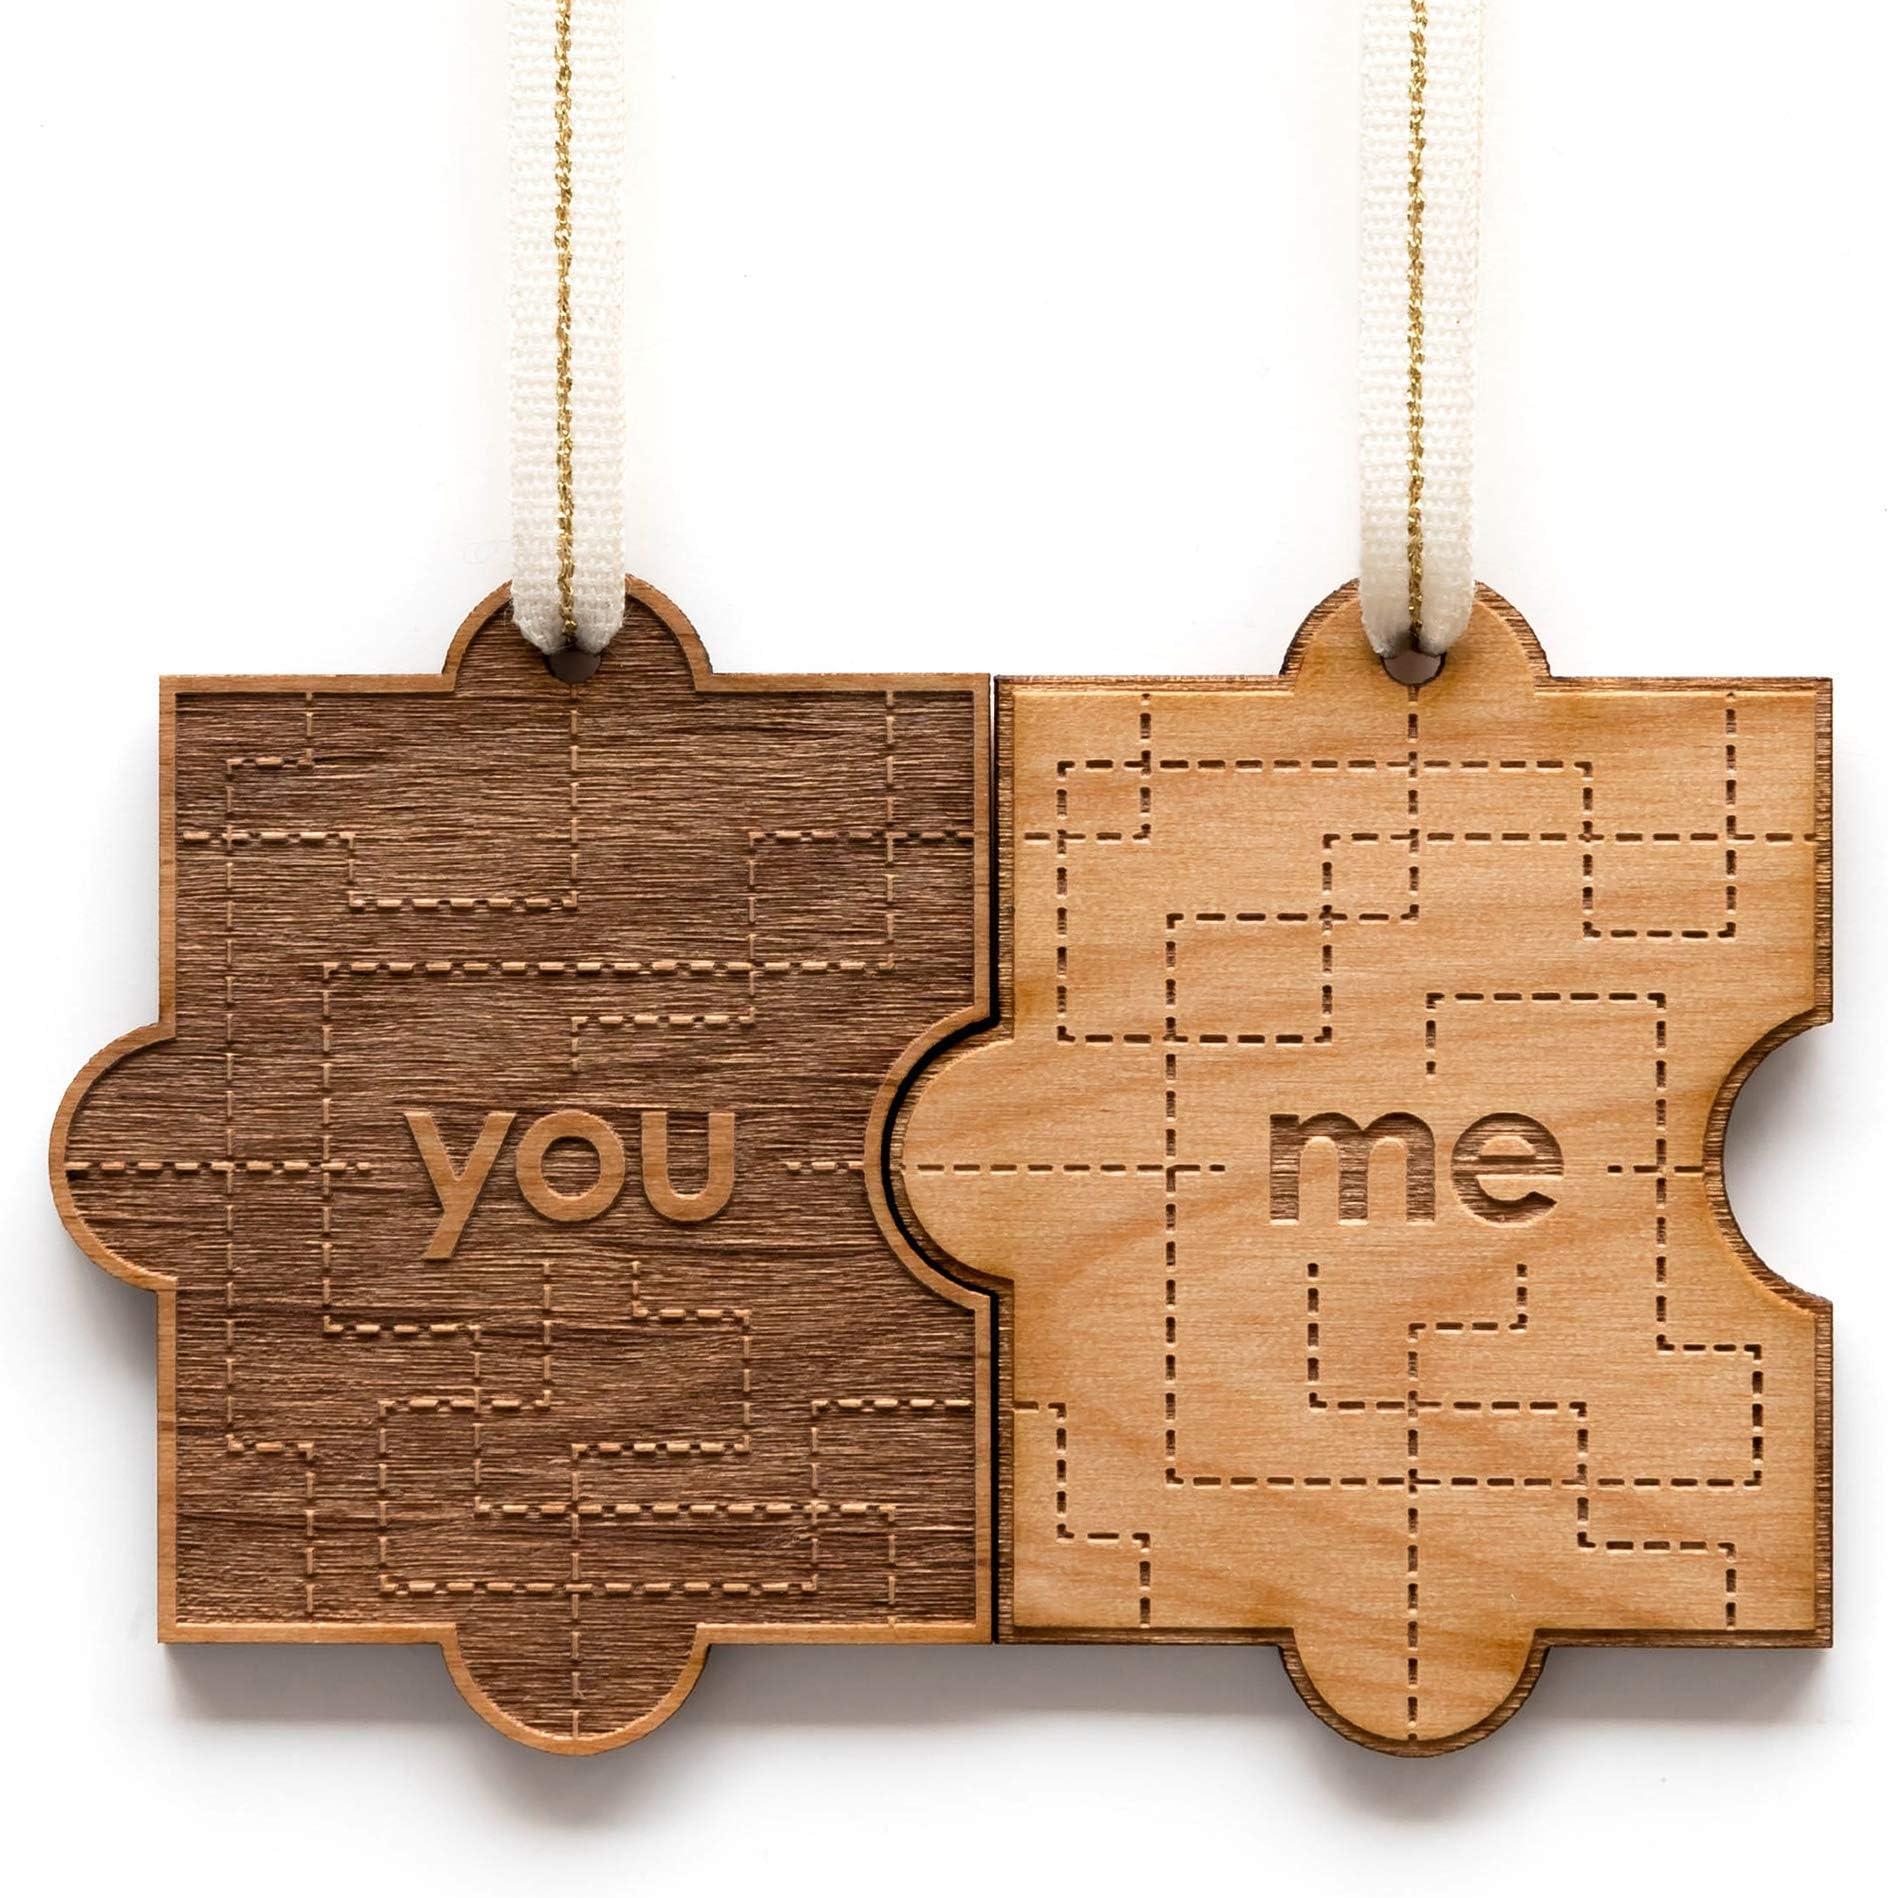 Wooden whale ornament 5th anniversary gift oak ornament